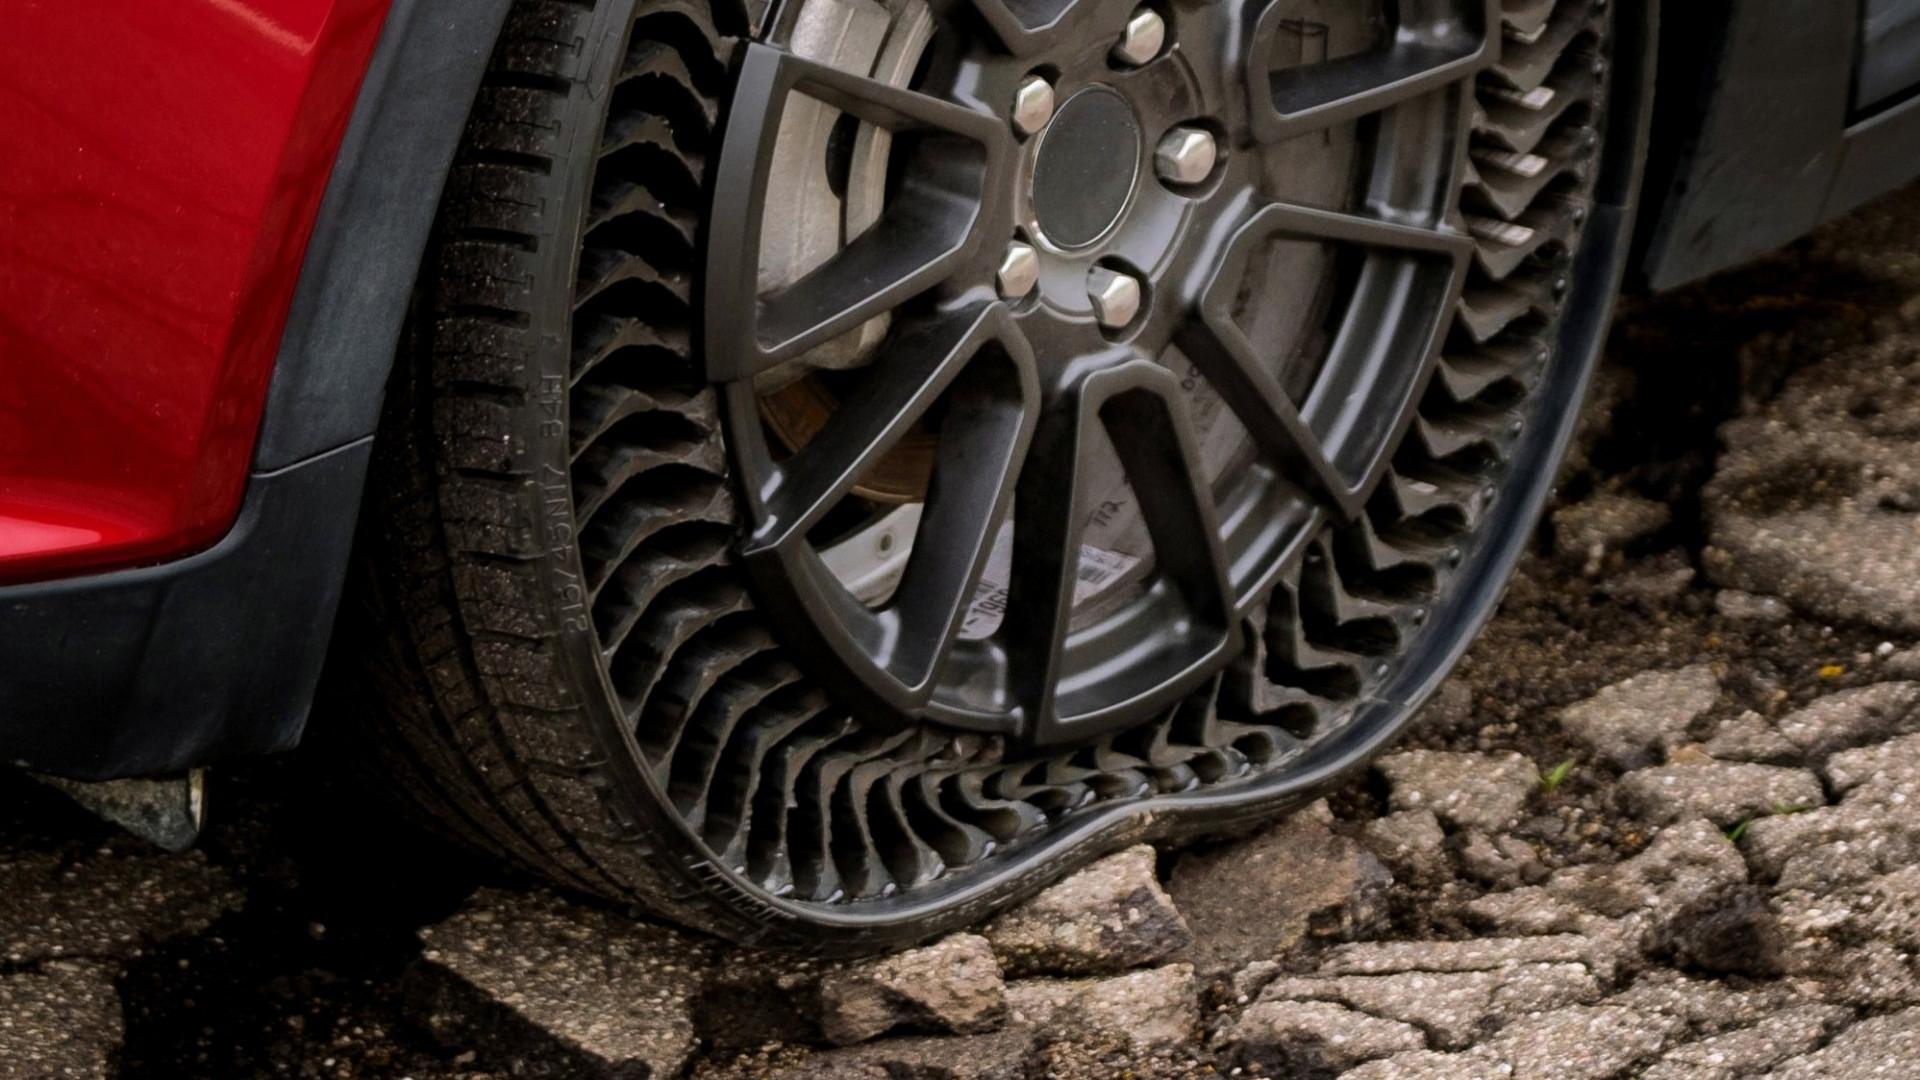 Michelin Uptis prototype tire, on Chevrolet Bolt EV